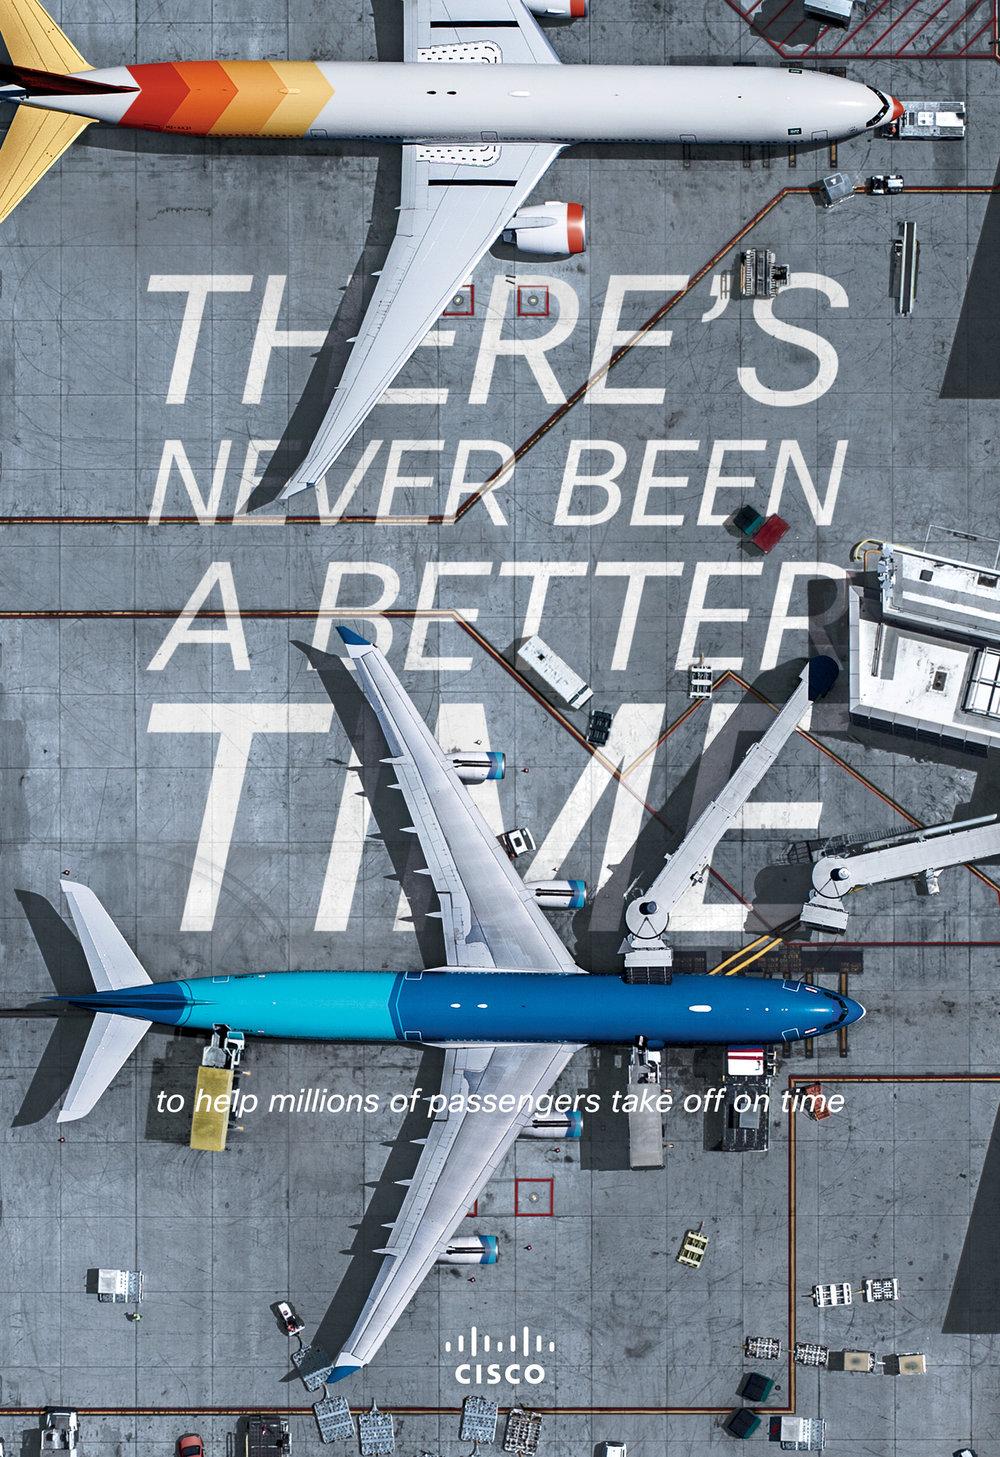 A22818_6e_0004_BusShelter_Planes.jpg